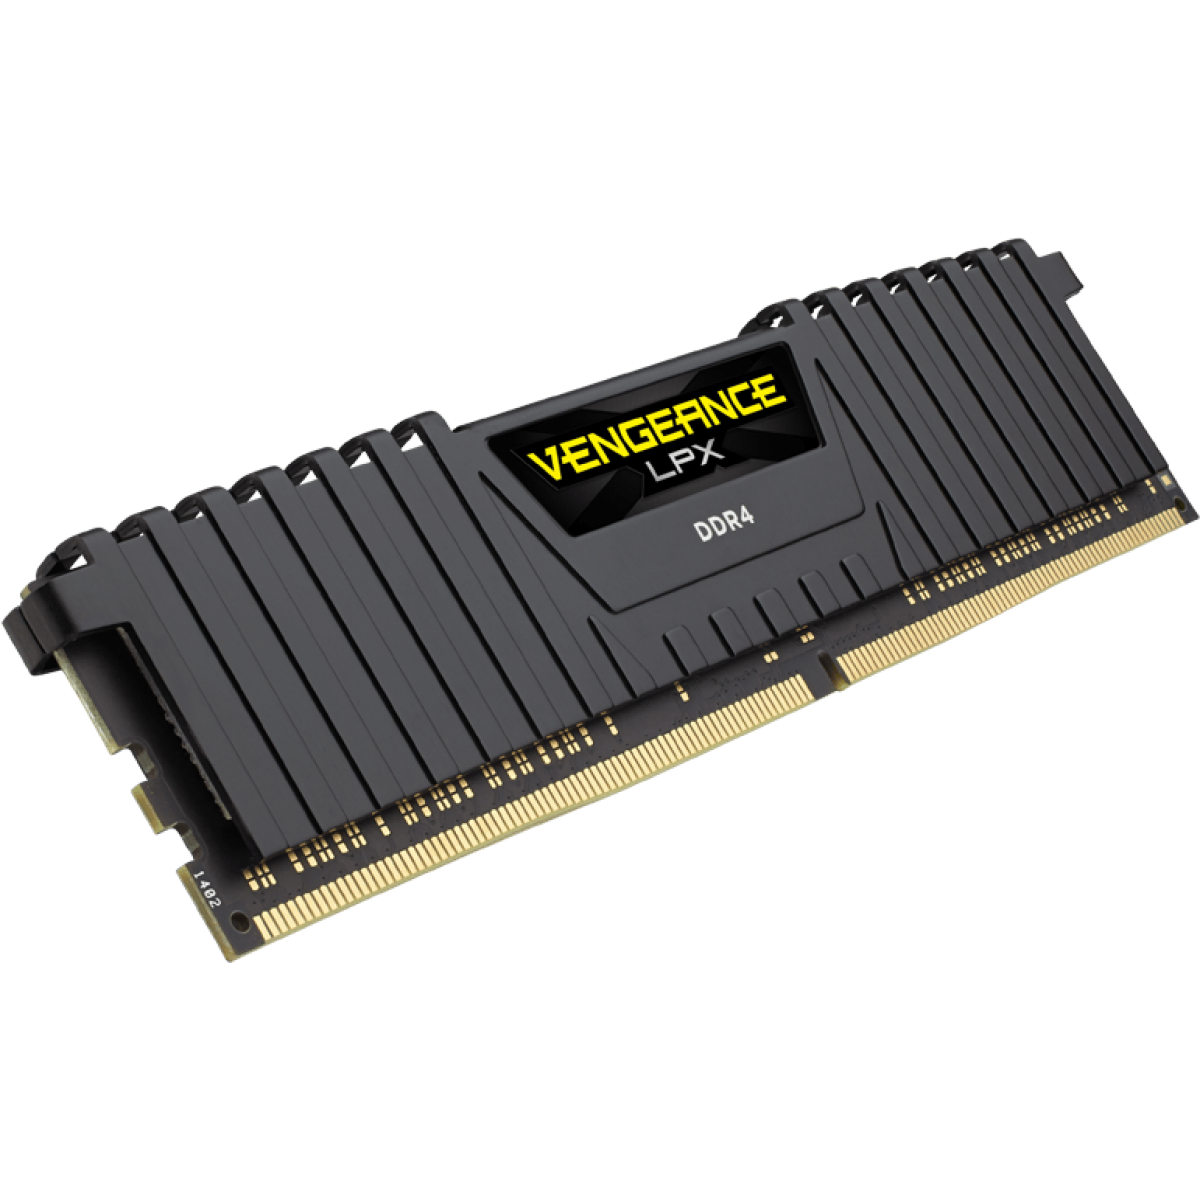 Memória DDR4 Corsair Vengeance LPX, 16GB (2x8GB) 2400MHz, Black, CMK16GX4M2A2400C14